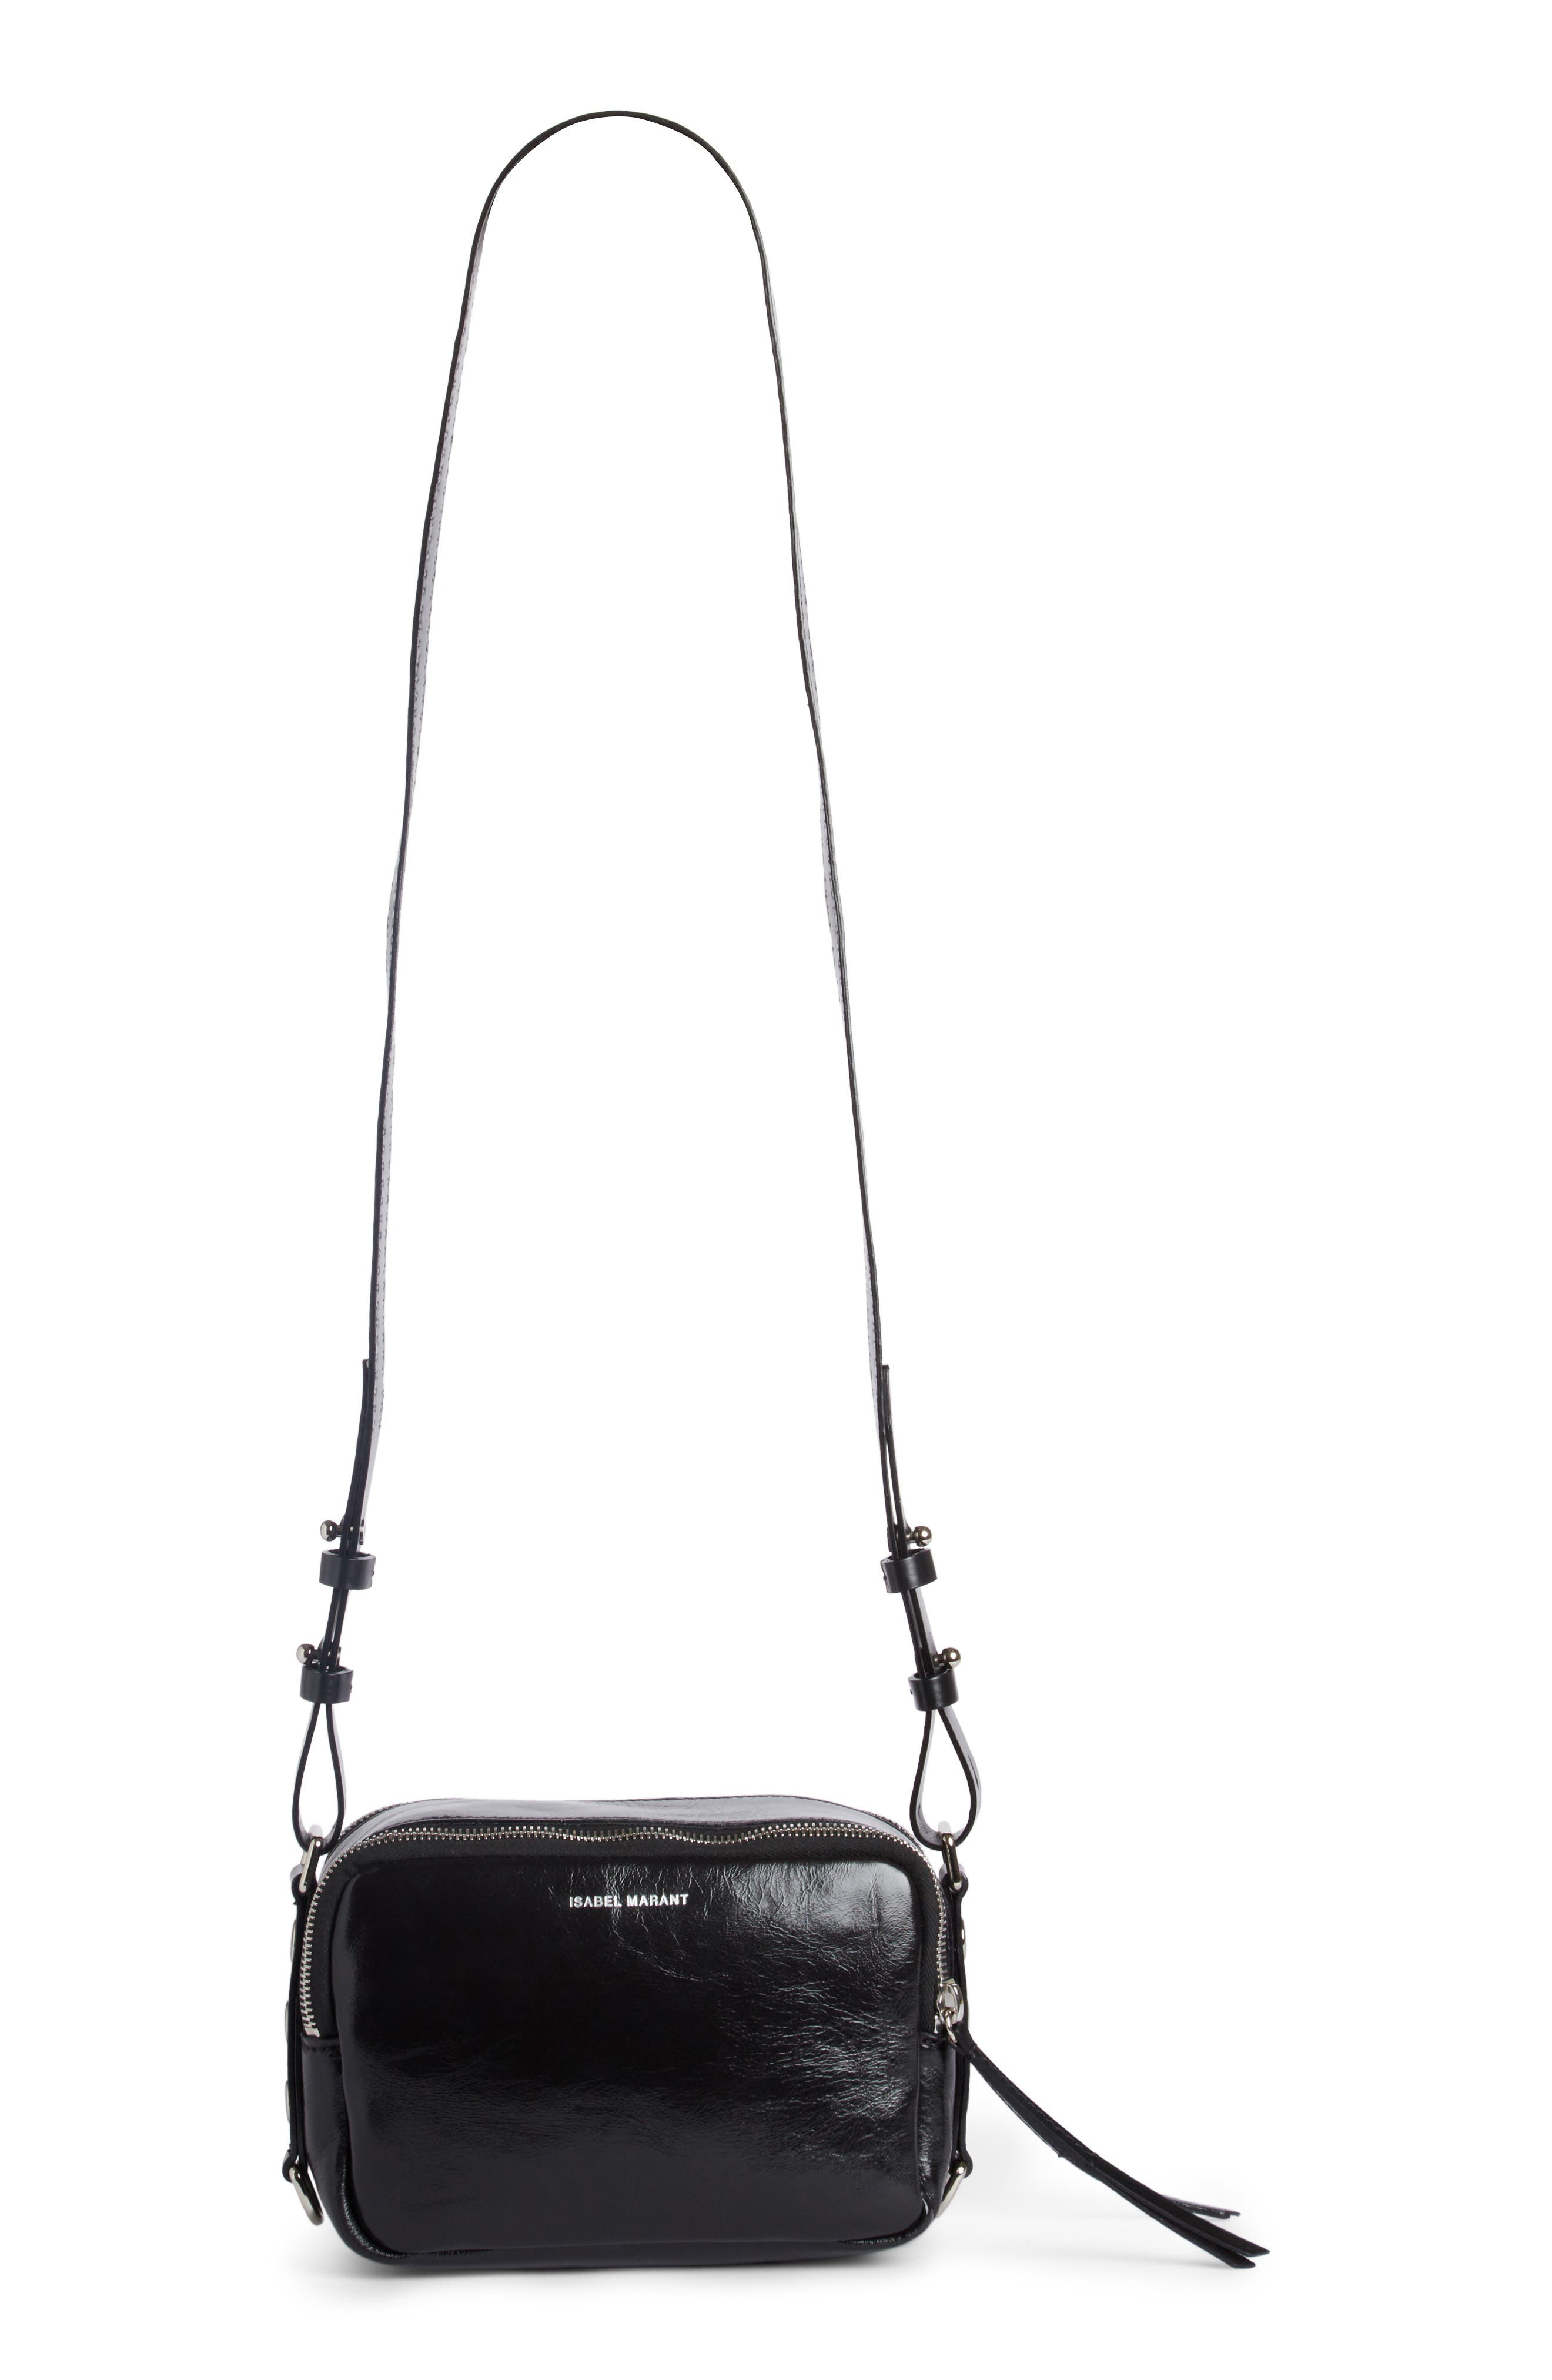 Tinley Studded Leather Crossbody Bag,                             Main thumbnail 1, color,                             003